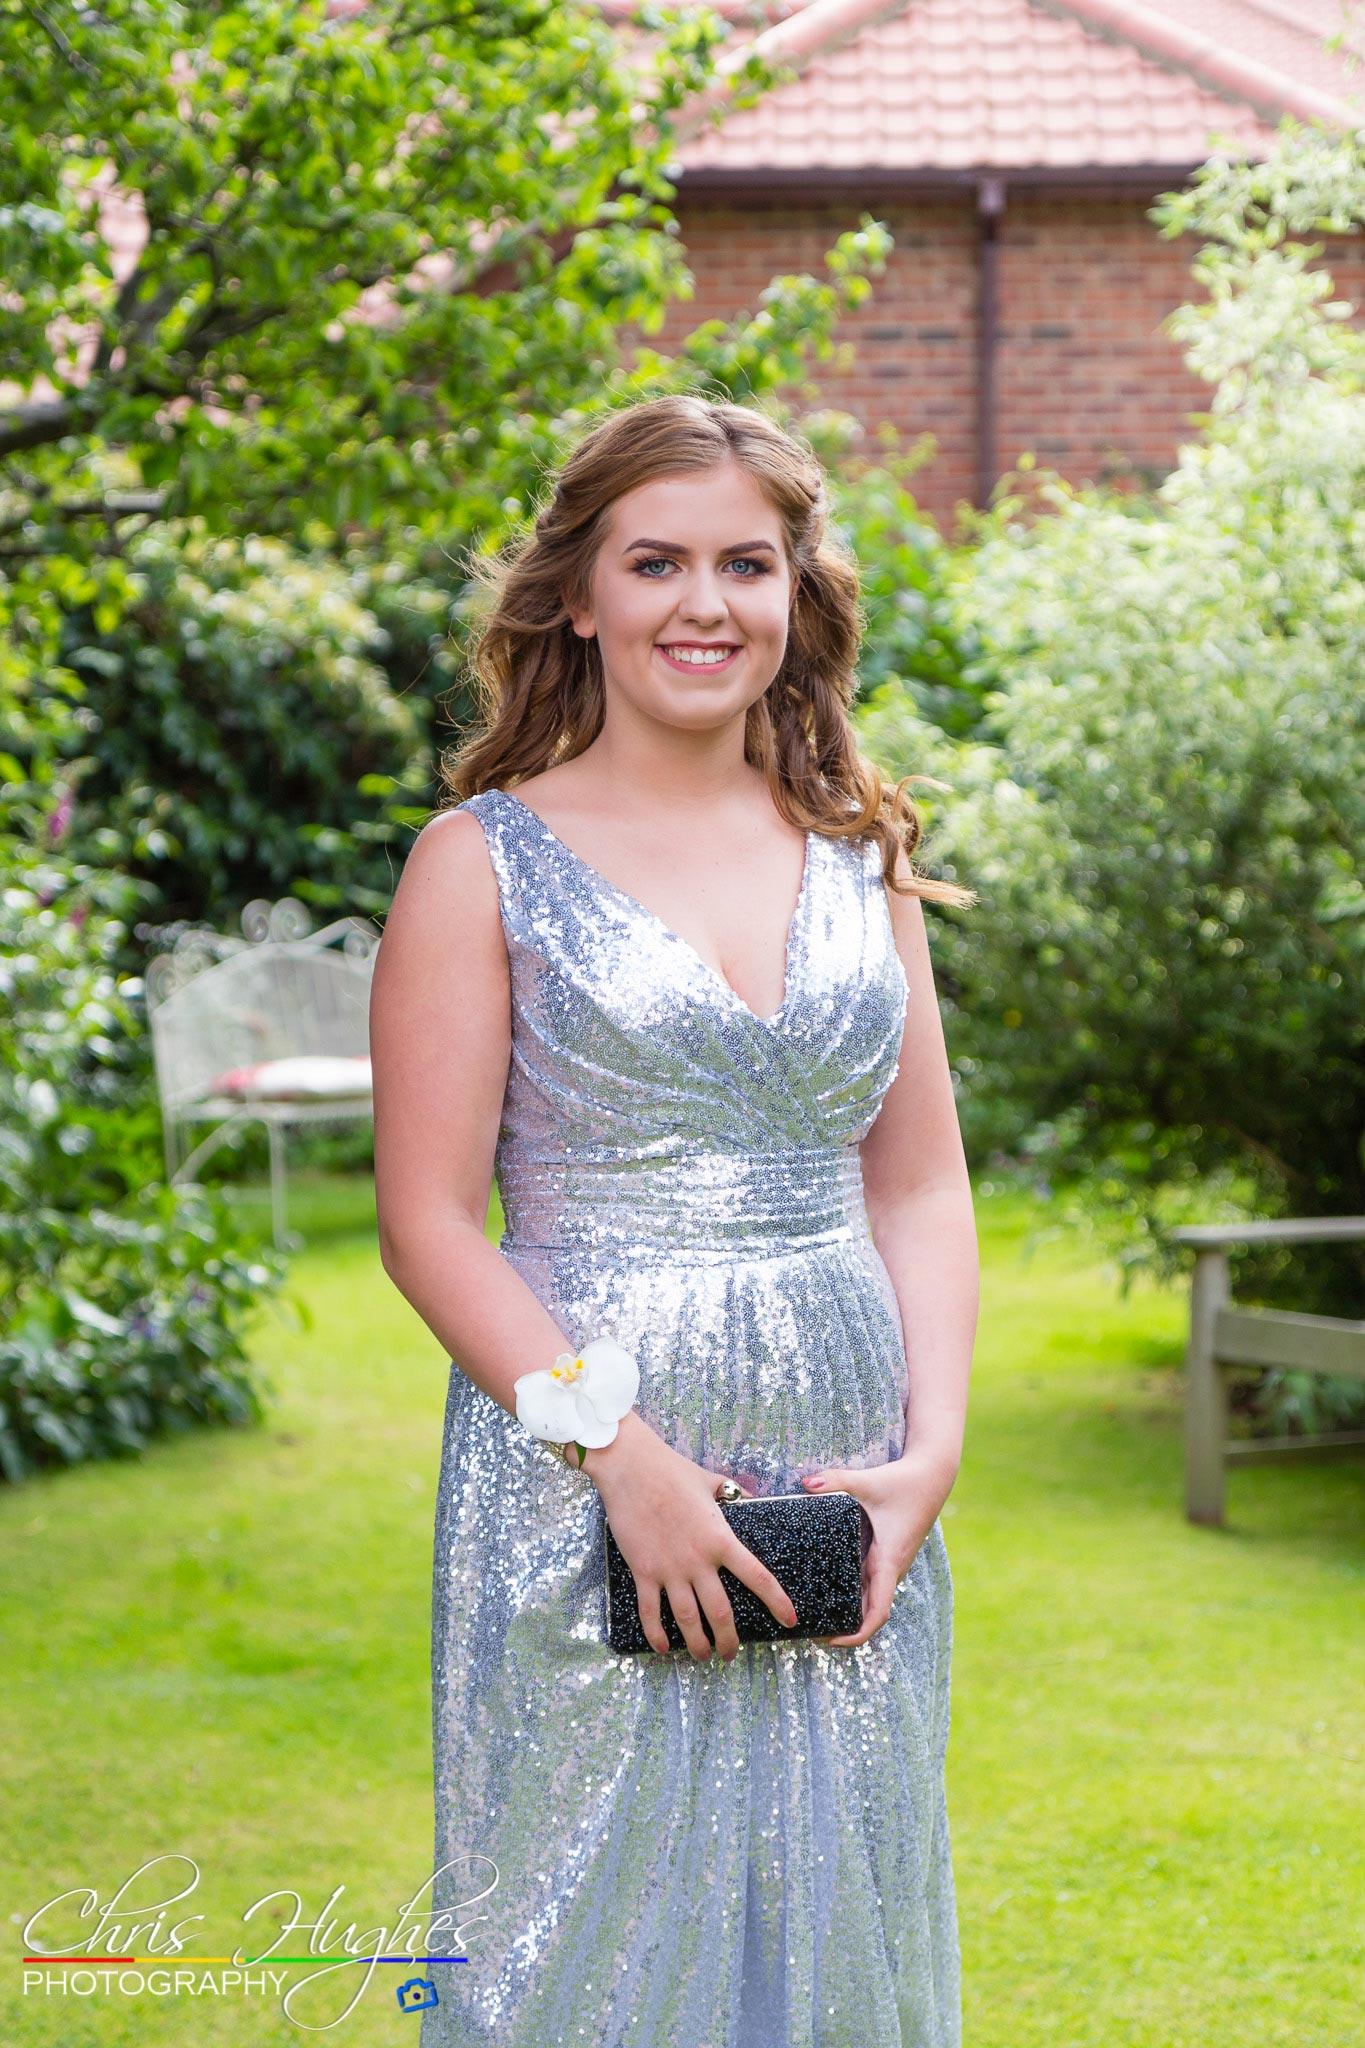 Portrait, Prom Photos & Garden Party, Darlington